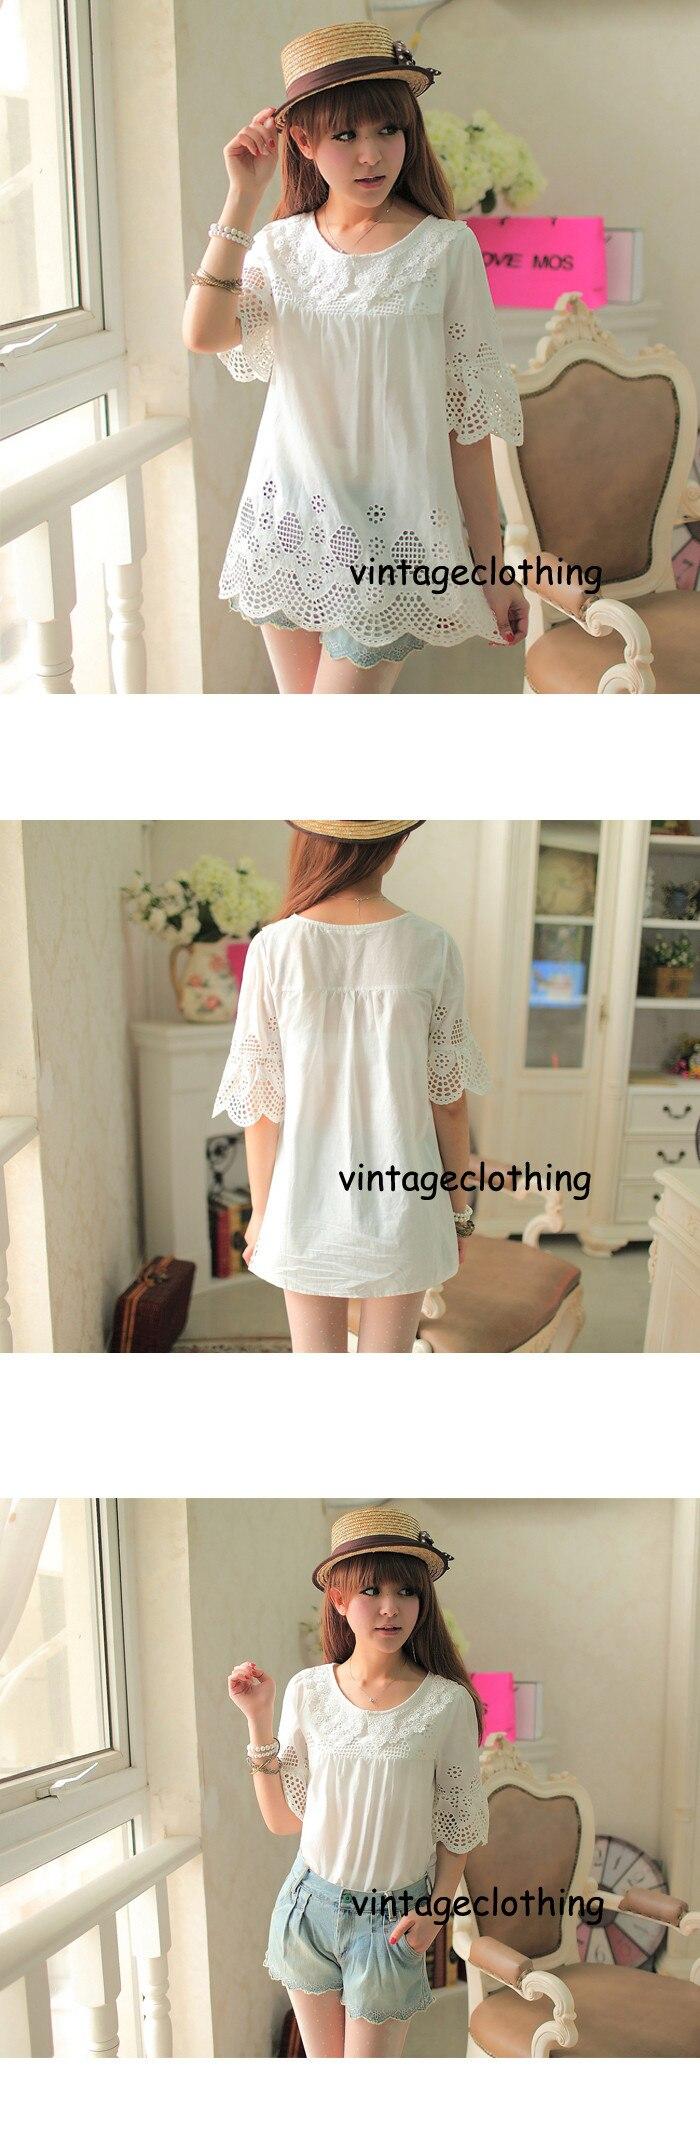 Vintage 70s Sheer Crochet Cut Out Embroidery Scallop Festival Blouse Dress Putih Renda A30554 62703 Detail 1